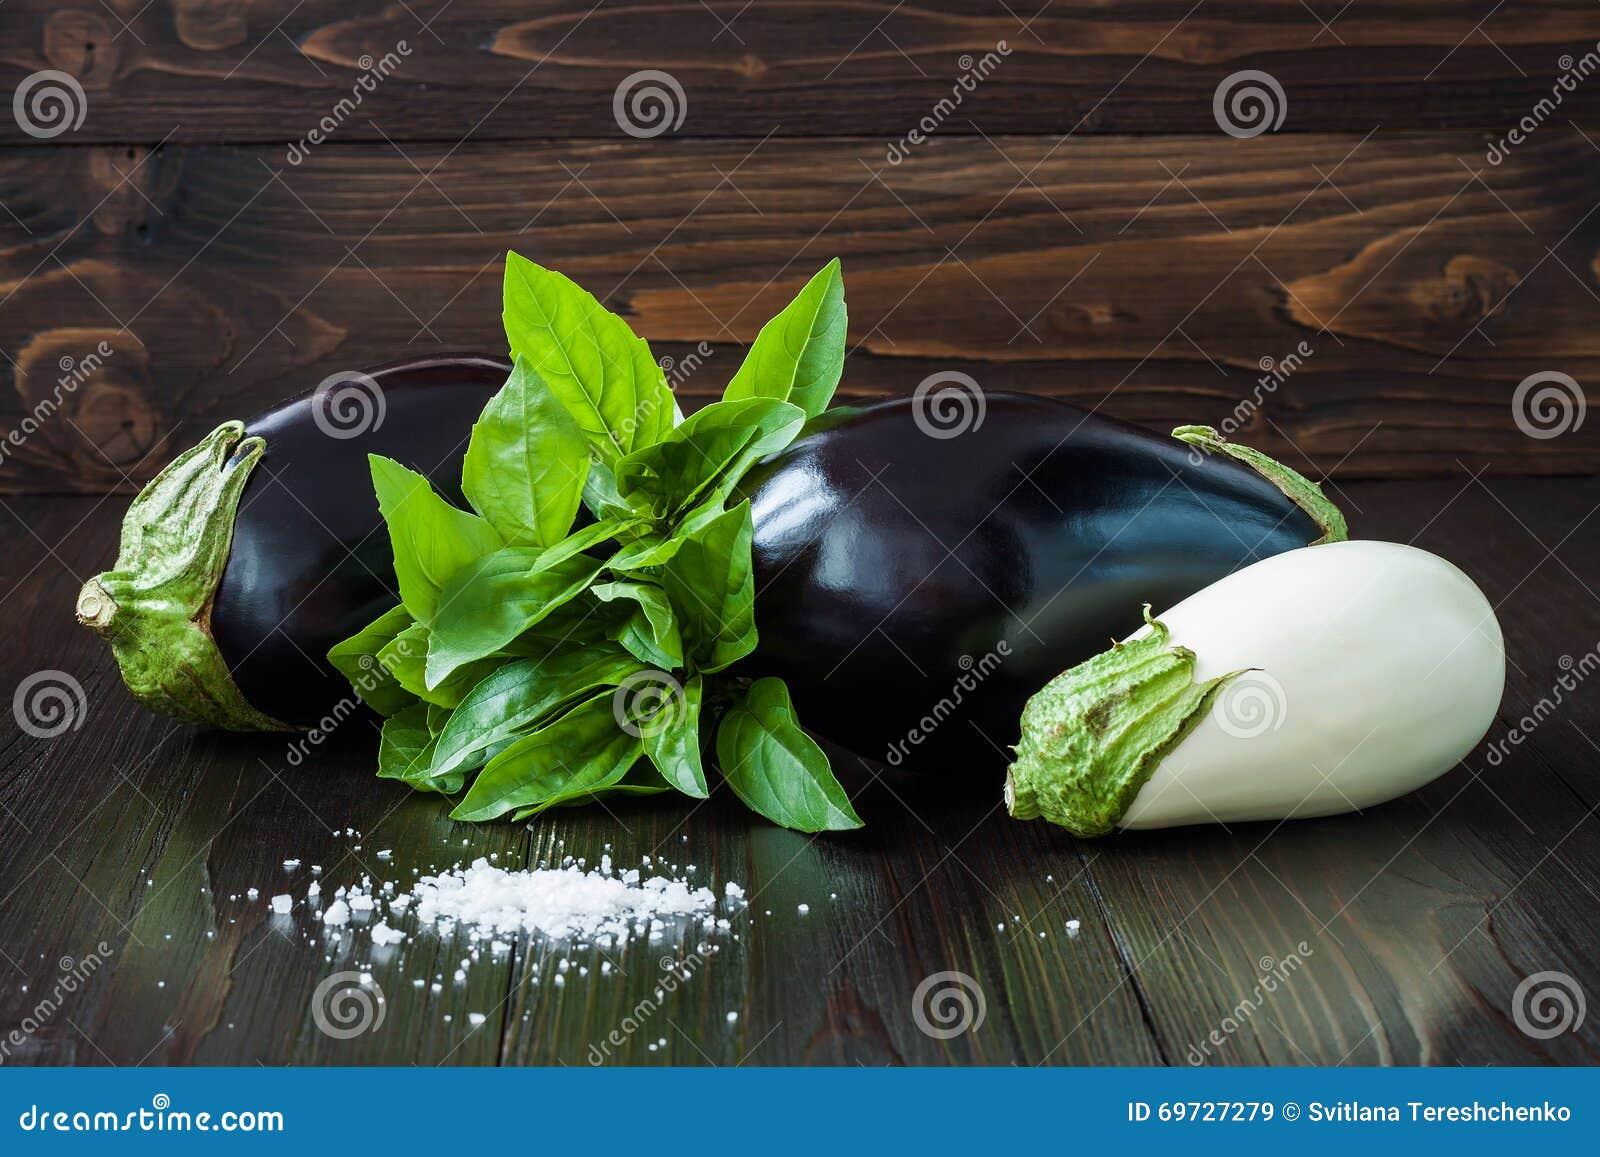 Purple And White Eggplant Aubergine With Basil On Dark